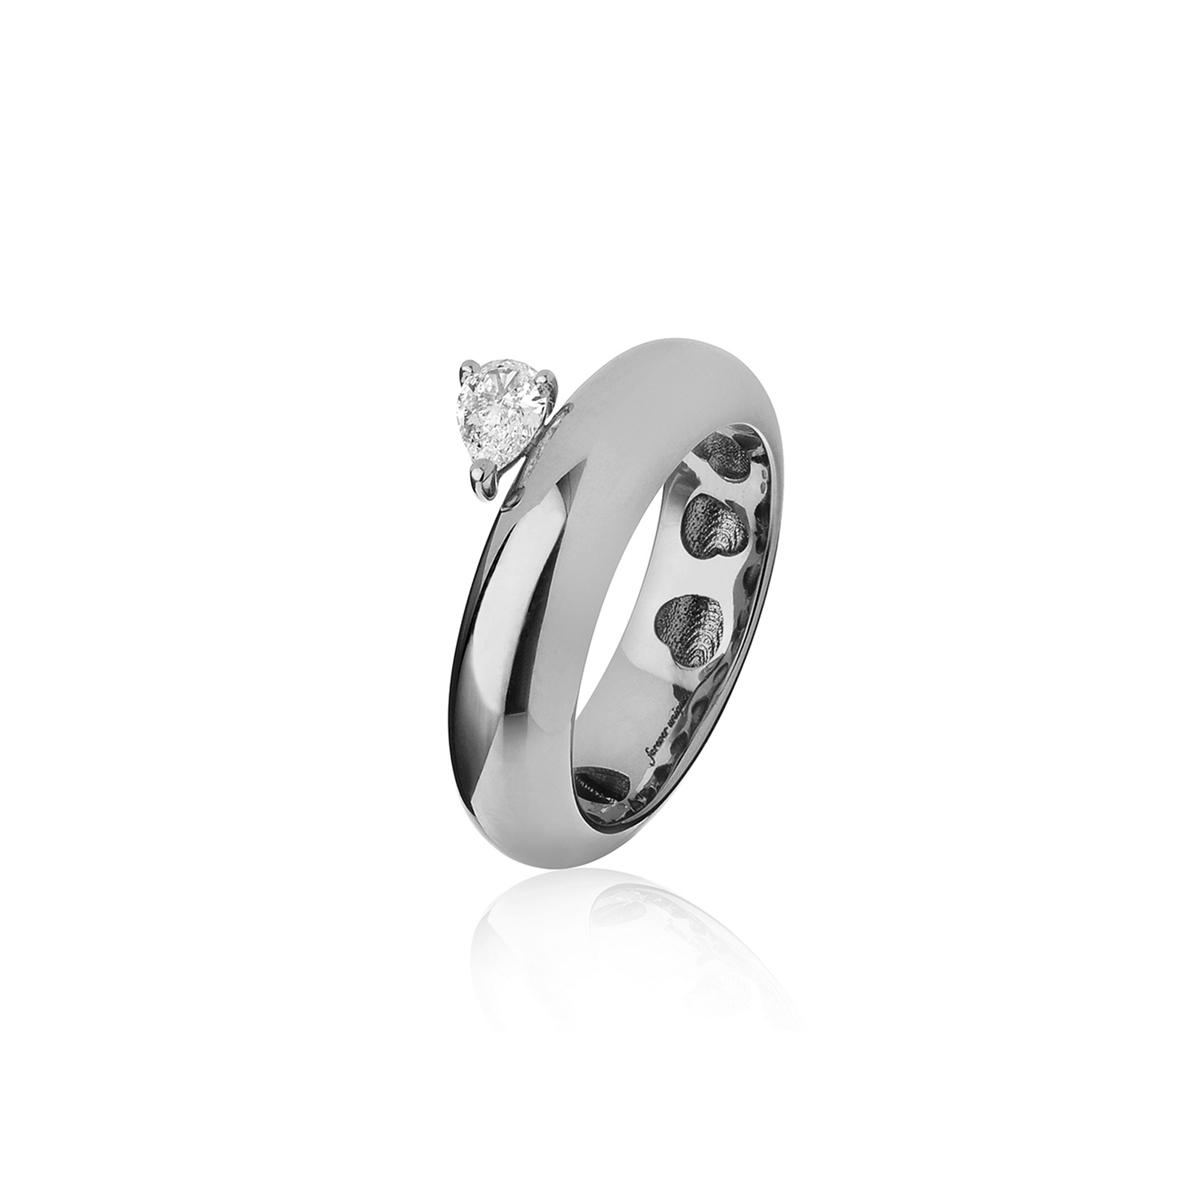 Chubby - Fancy Diamond Drop Ring (Wide Version)